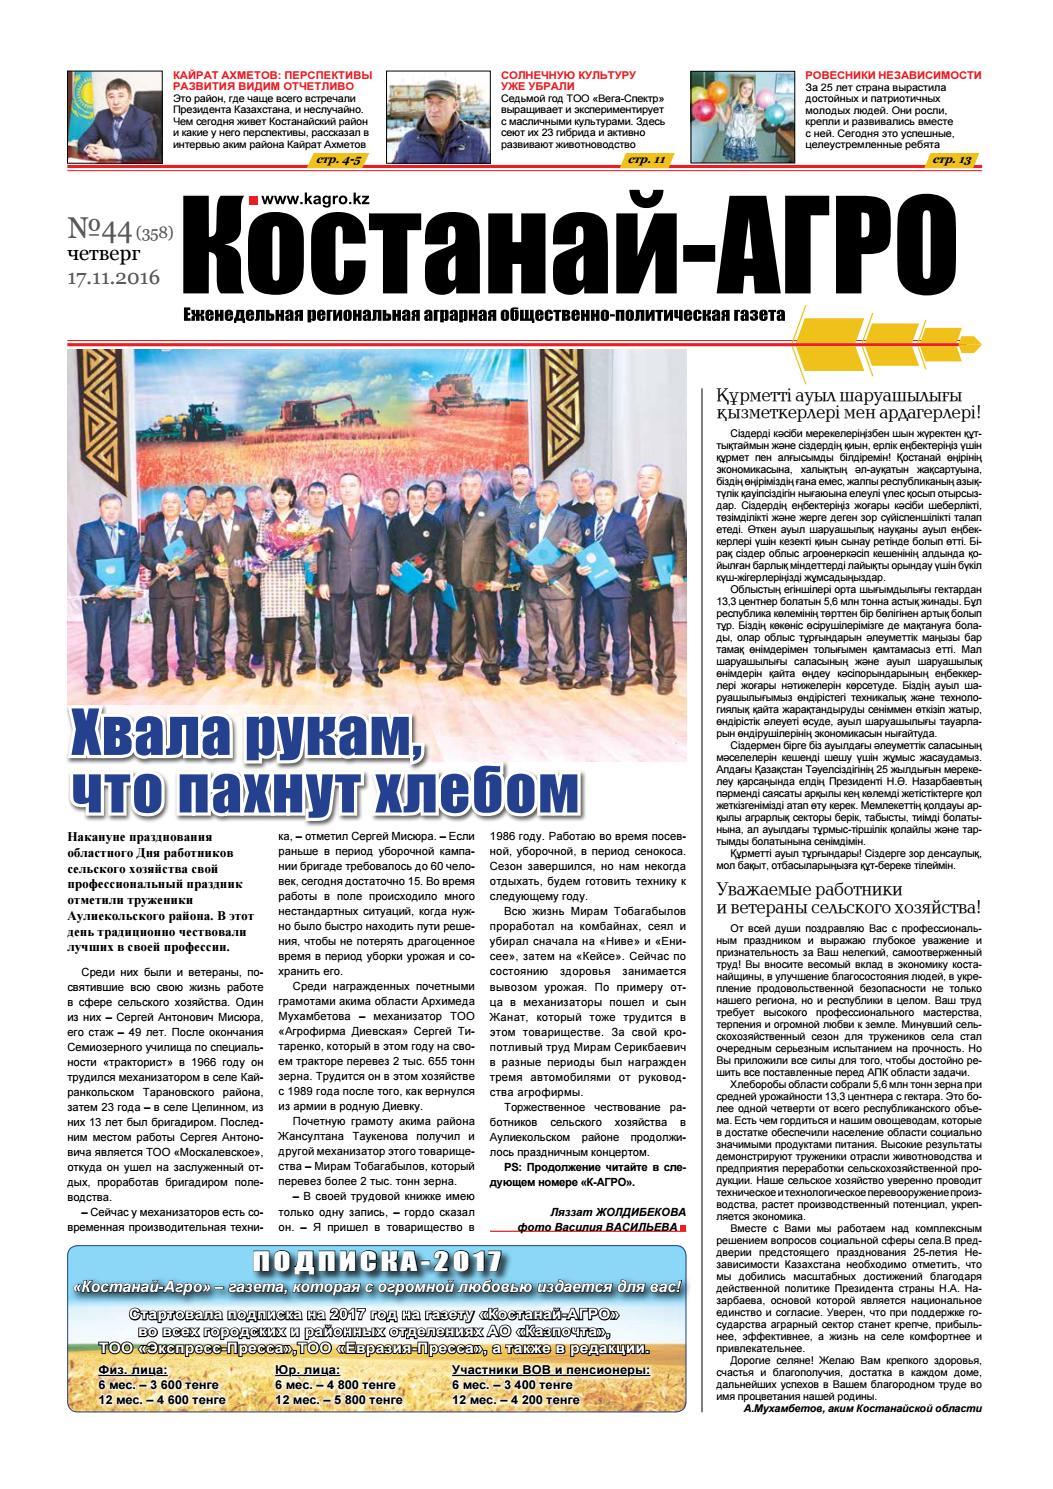 Костанайские Новости Газета Нам Шпаргалки